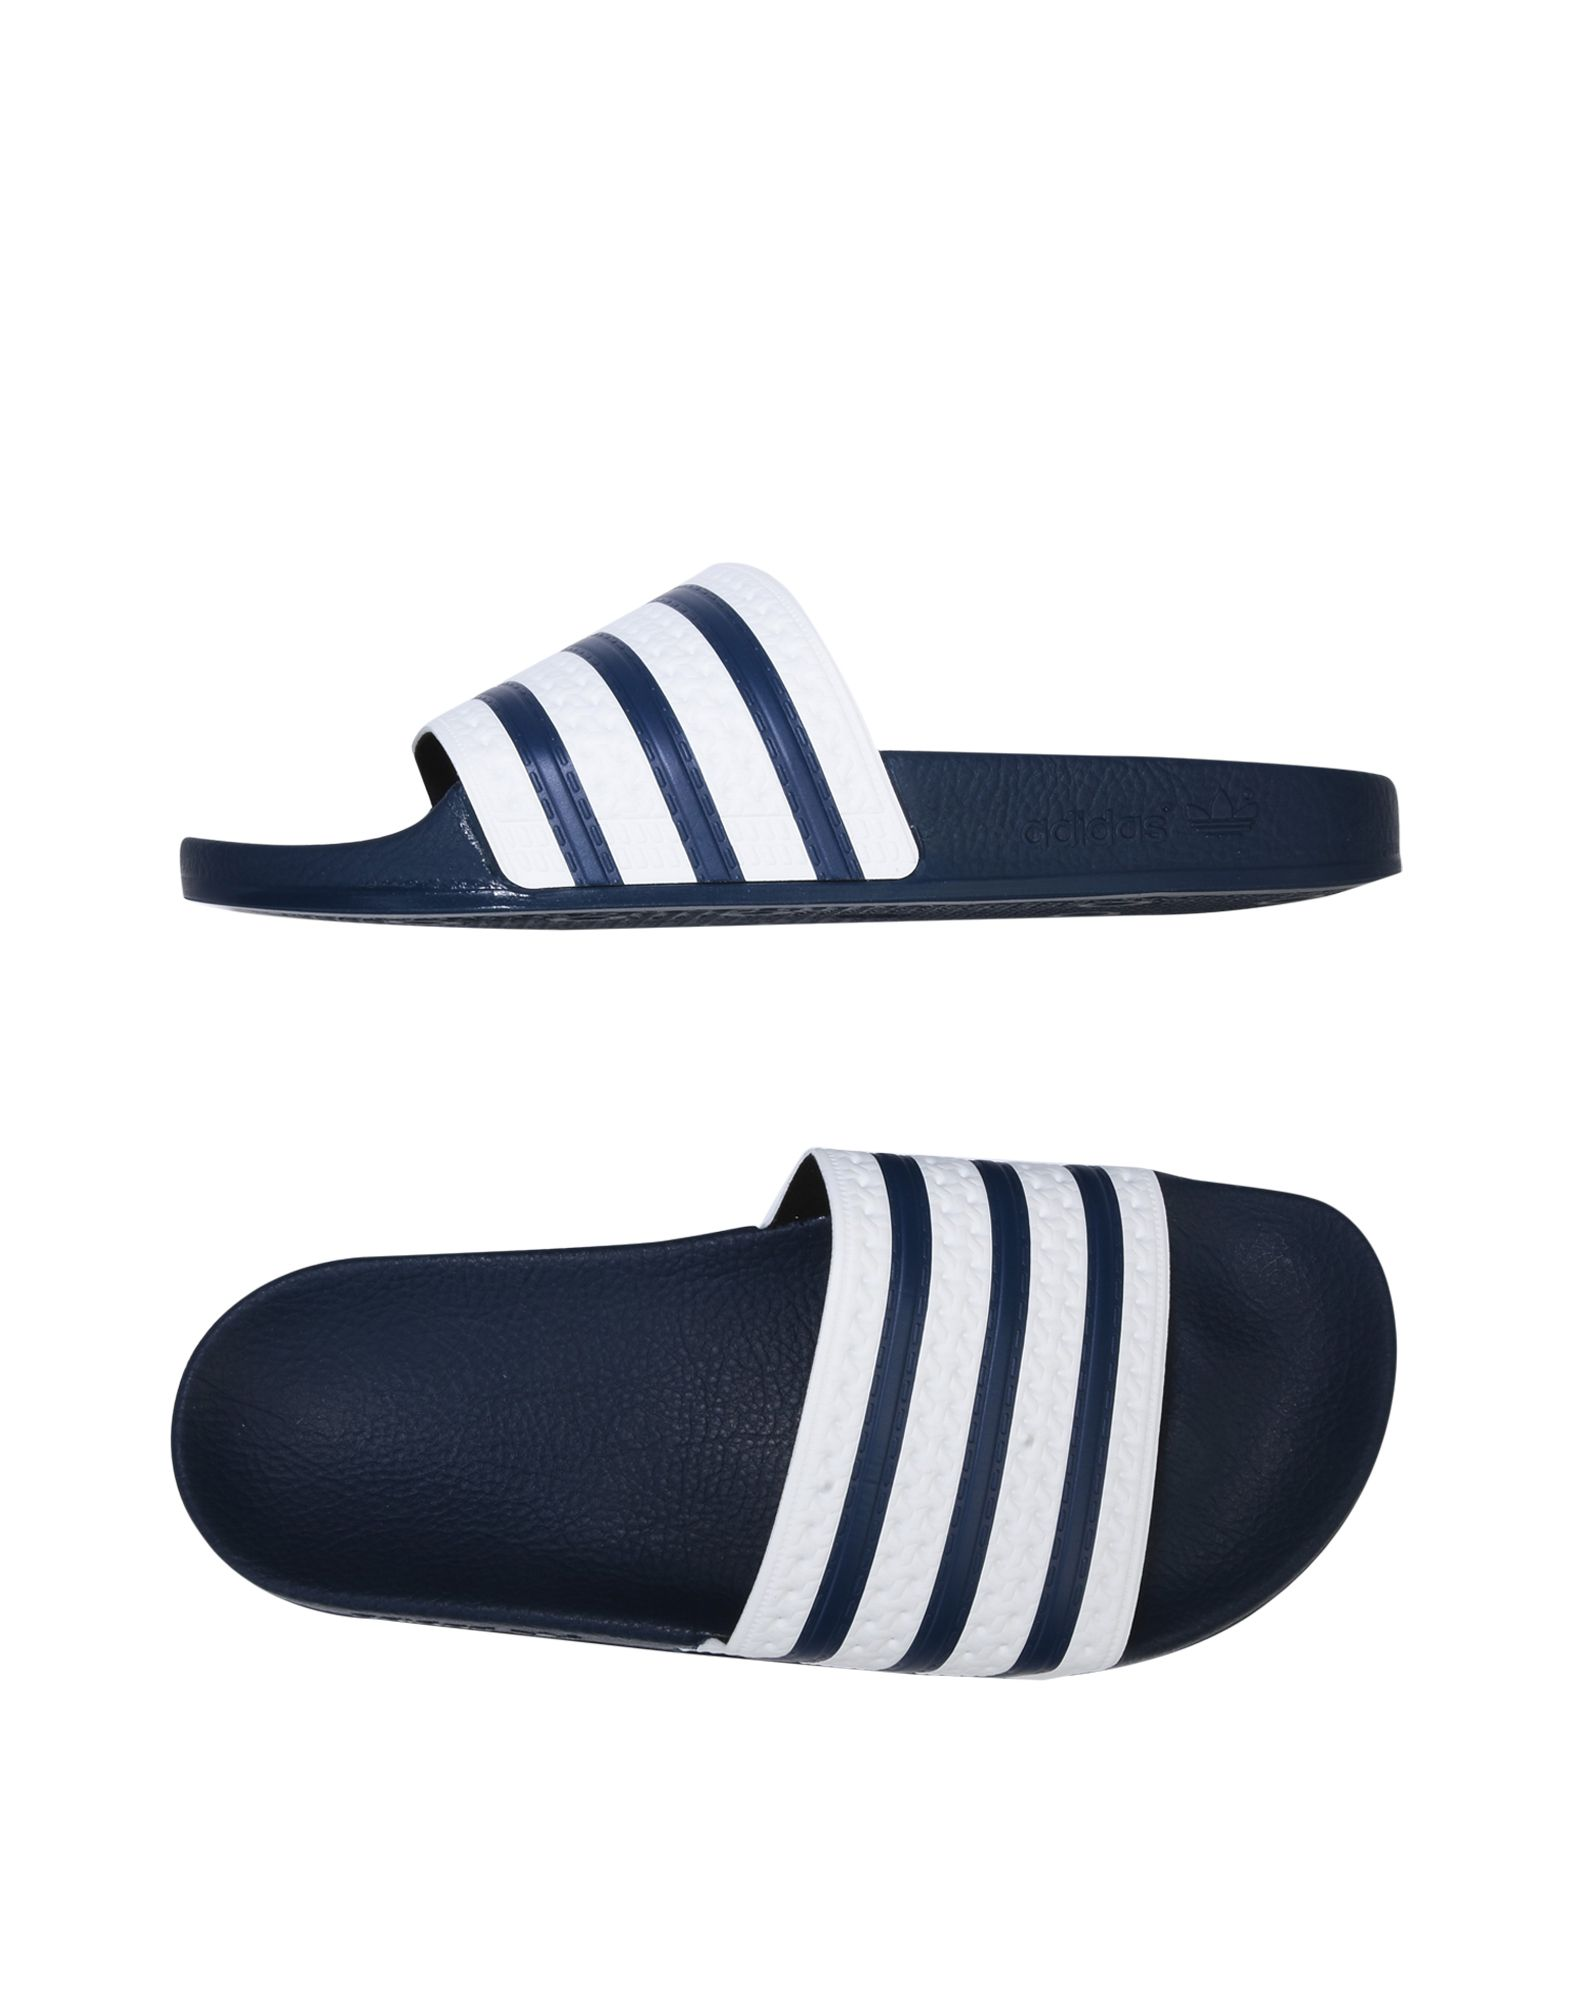 d1783a0e07b8d Adidas Originals Adidas Adilette - Sandals - Women Adidas Originals ...